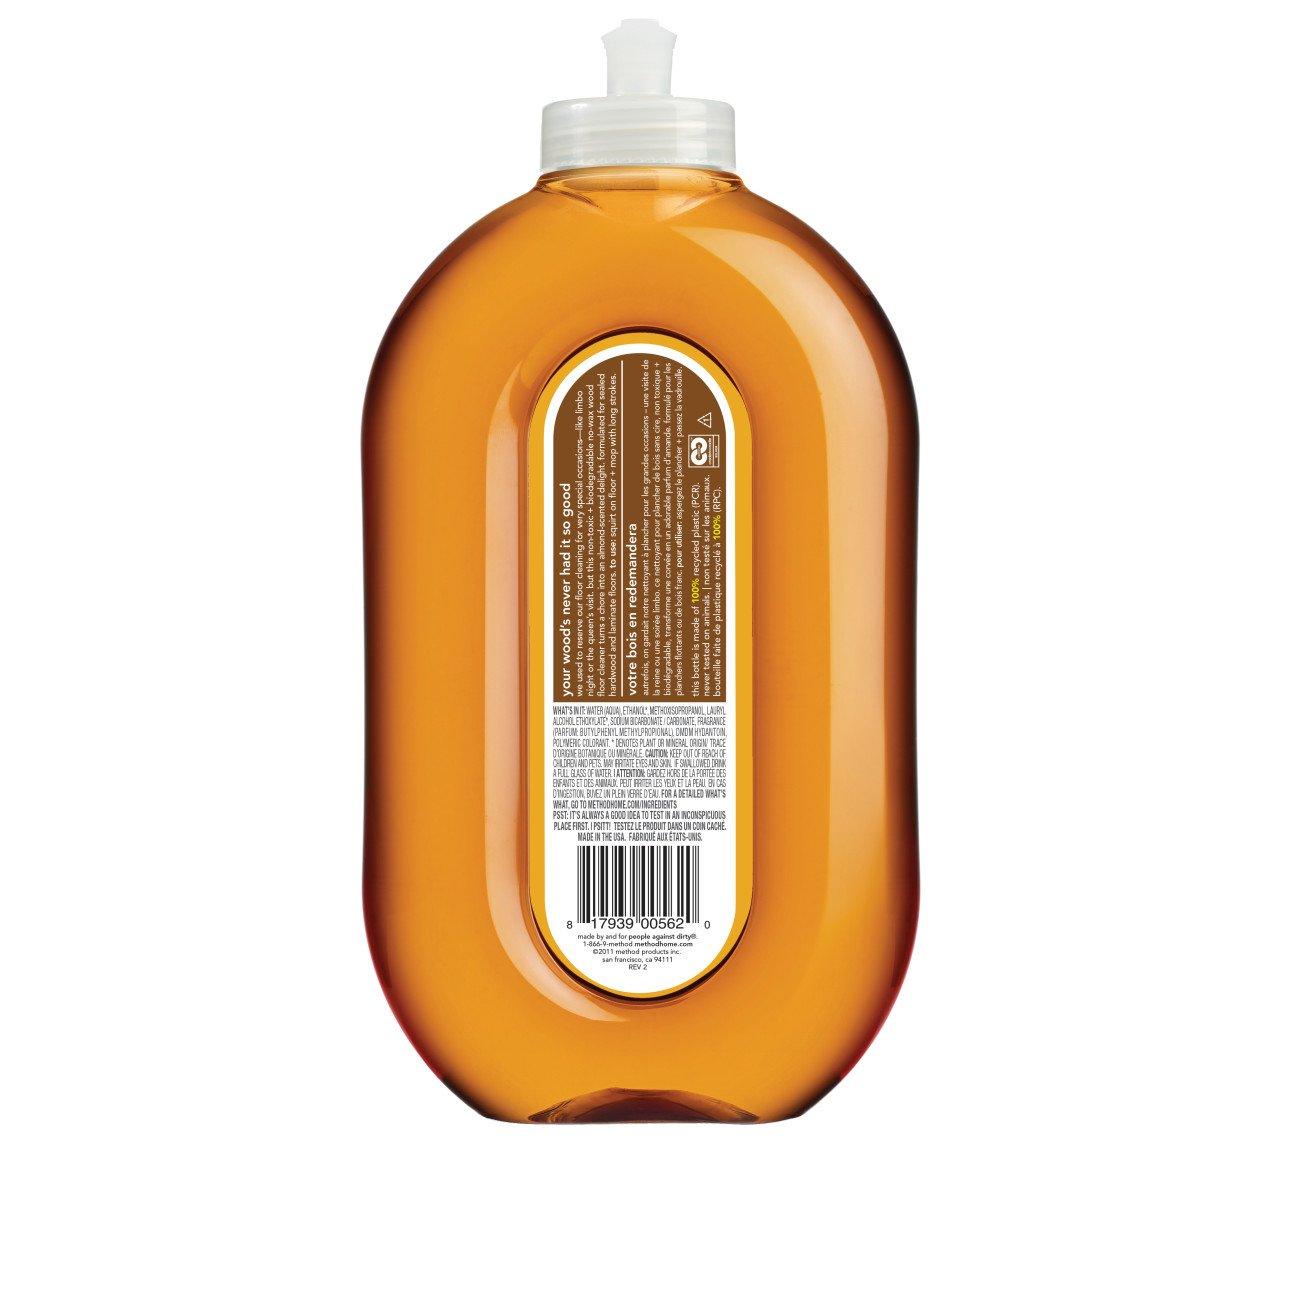 Method Squirt + Mop Hardwood Floor Cleaner, Almond, 25 Ounce (Pack 6) by Method (Image #4)